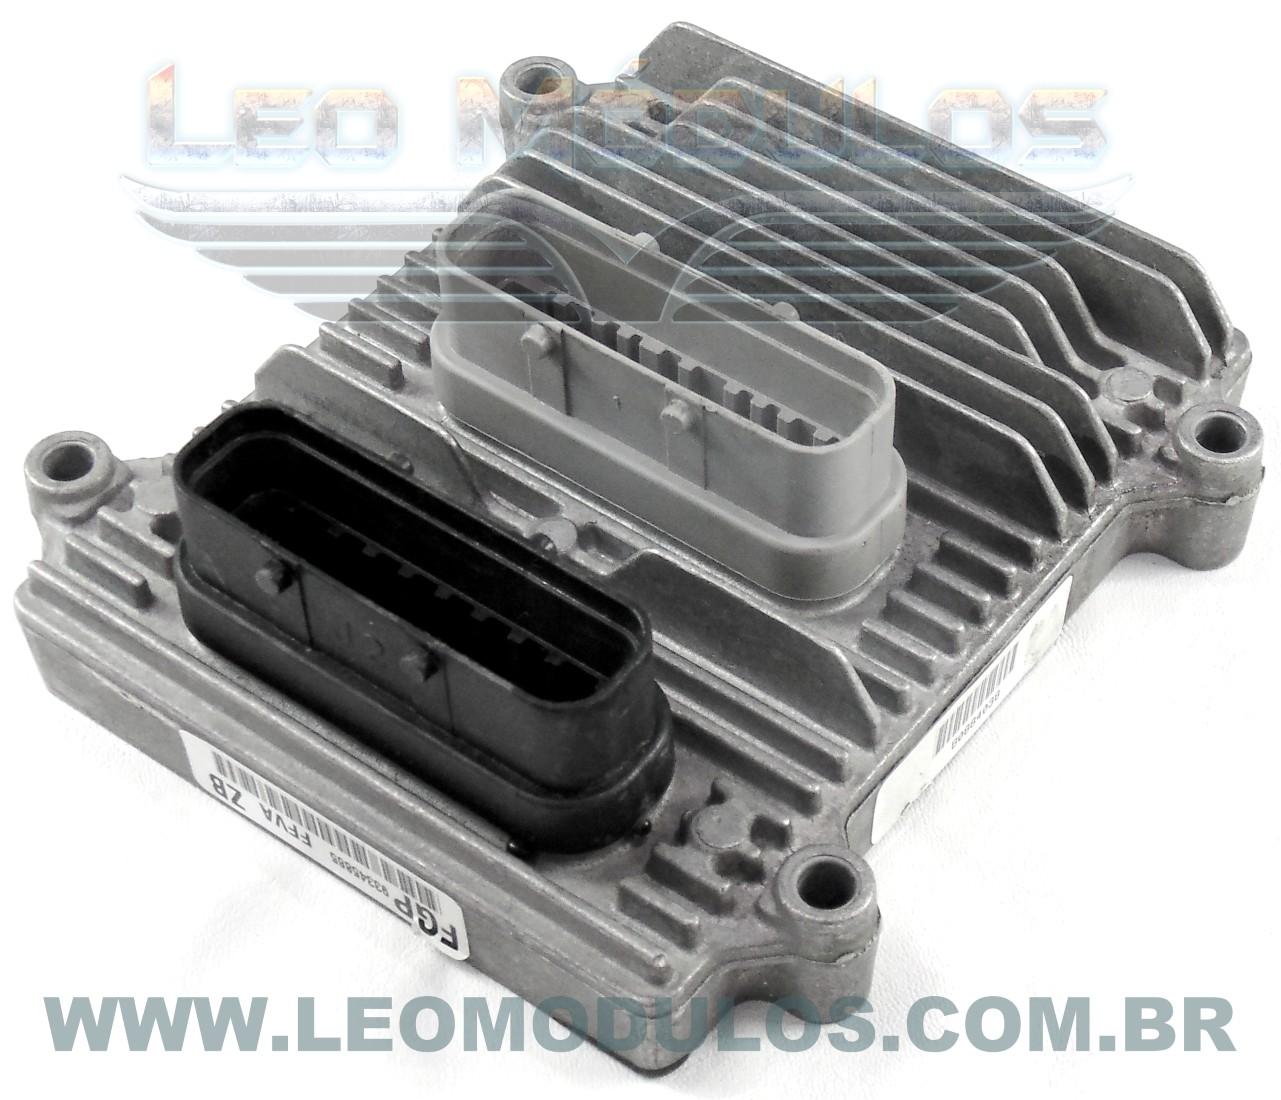 Módulo de injeção multec H - FFVA ZB 93345865 - Chevrolet Prisma 1.4 8v Flex - FFVA ZB - Leo Módulos